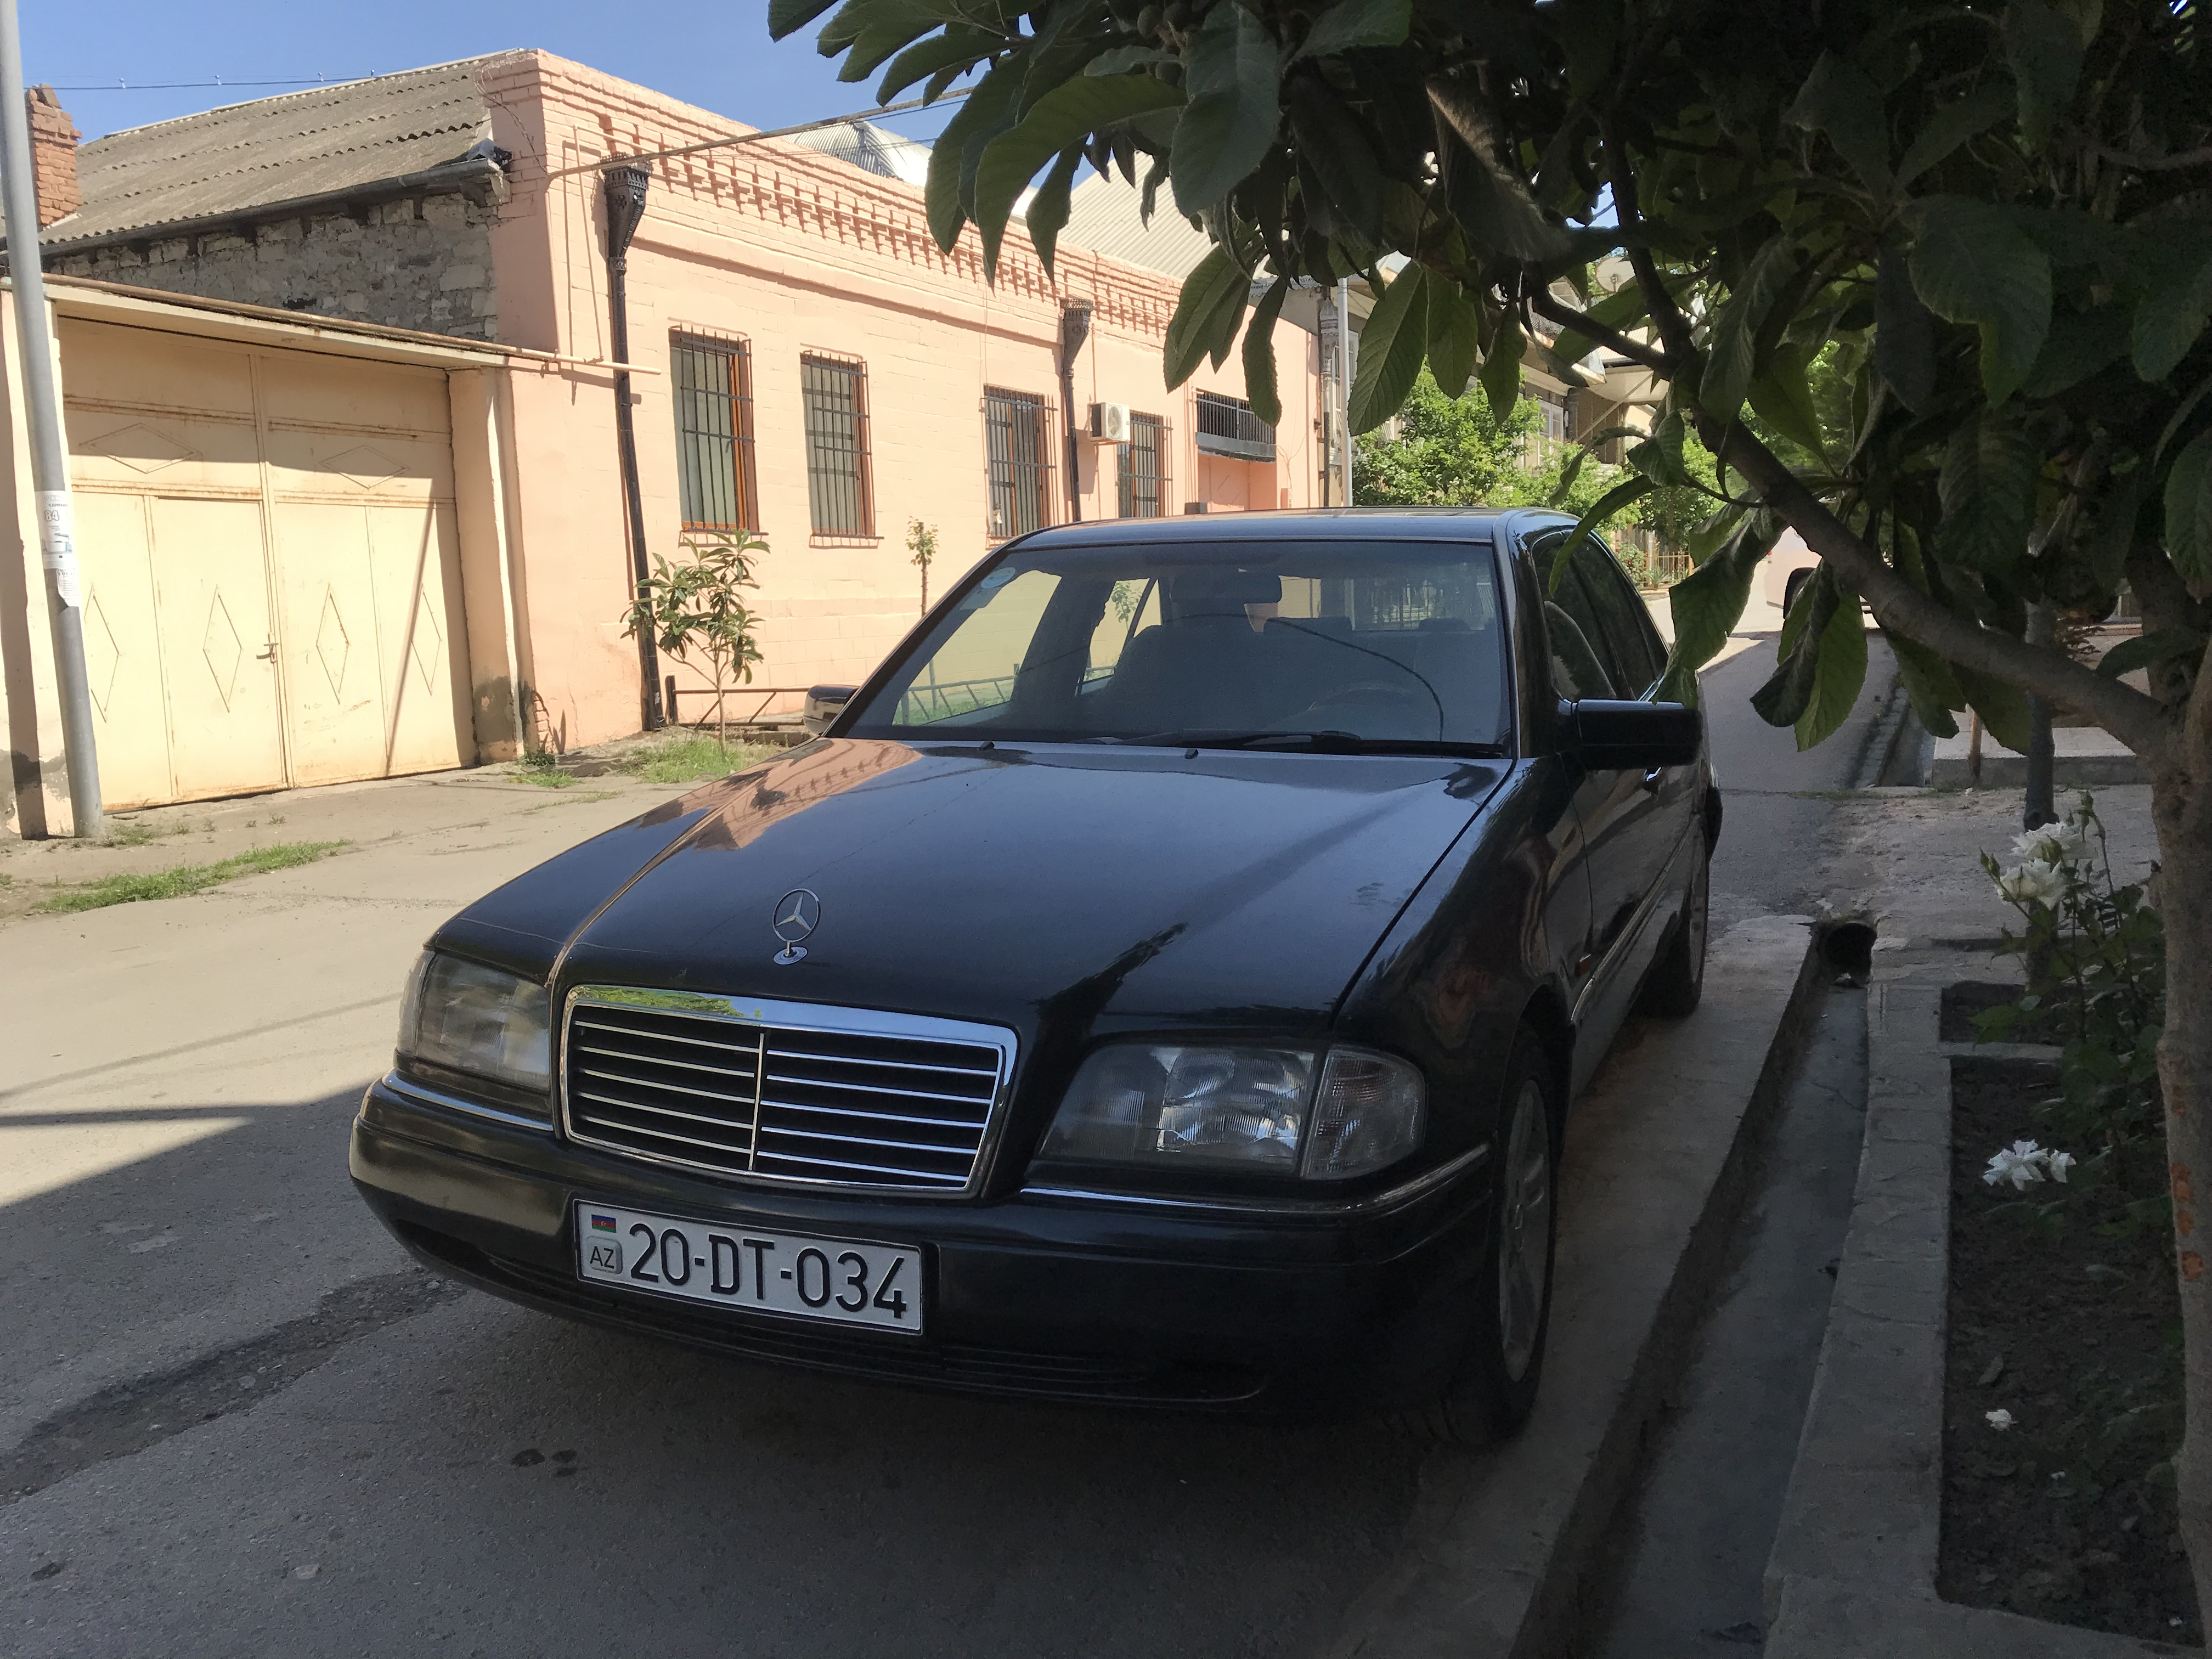 Mercedes-Benz C 220 2.2(lt) 1994 İkinci əl  $8000